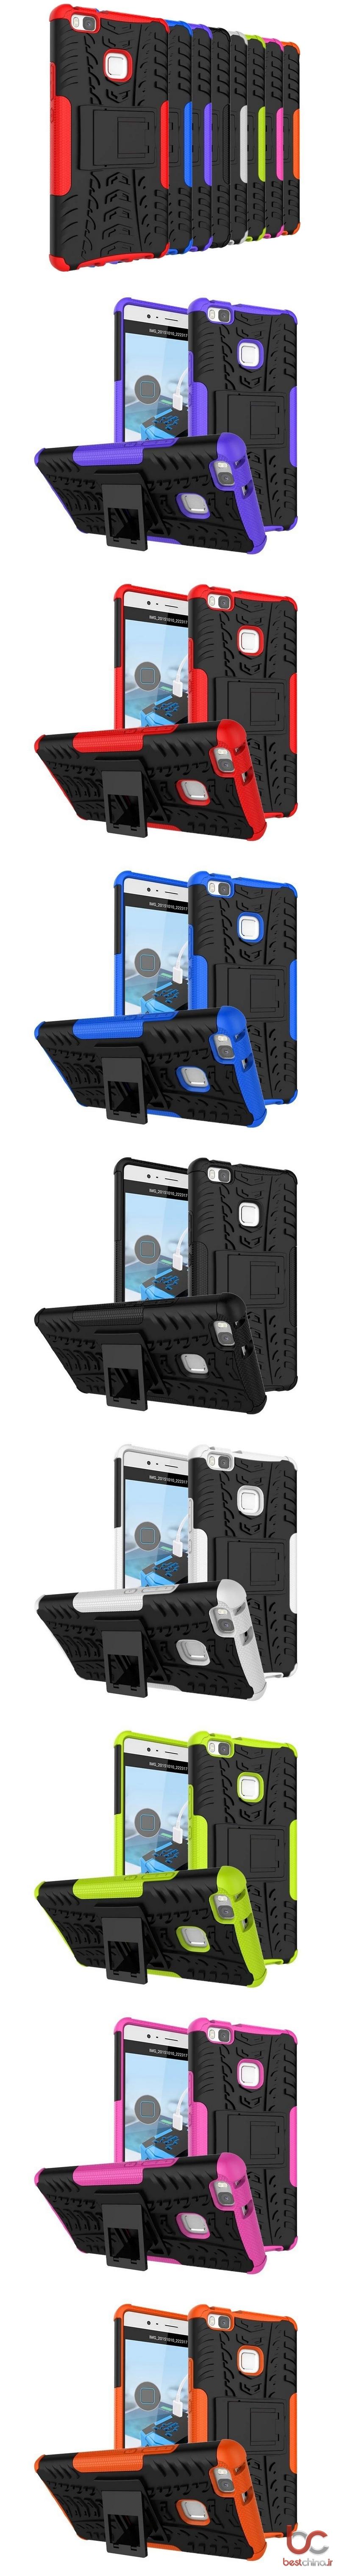 Huawei P9 Lite Armor Back Cover (1)